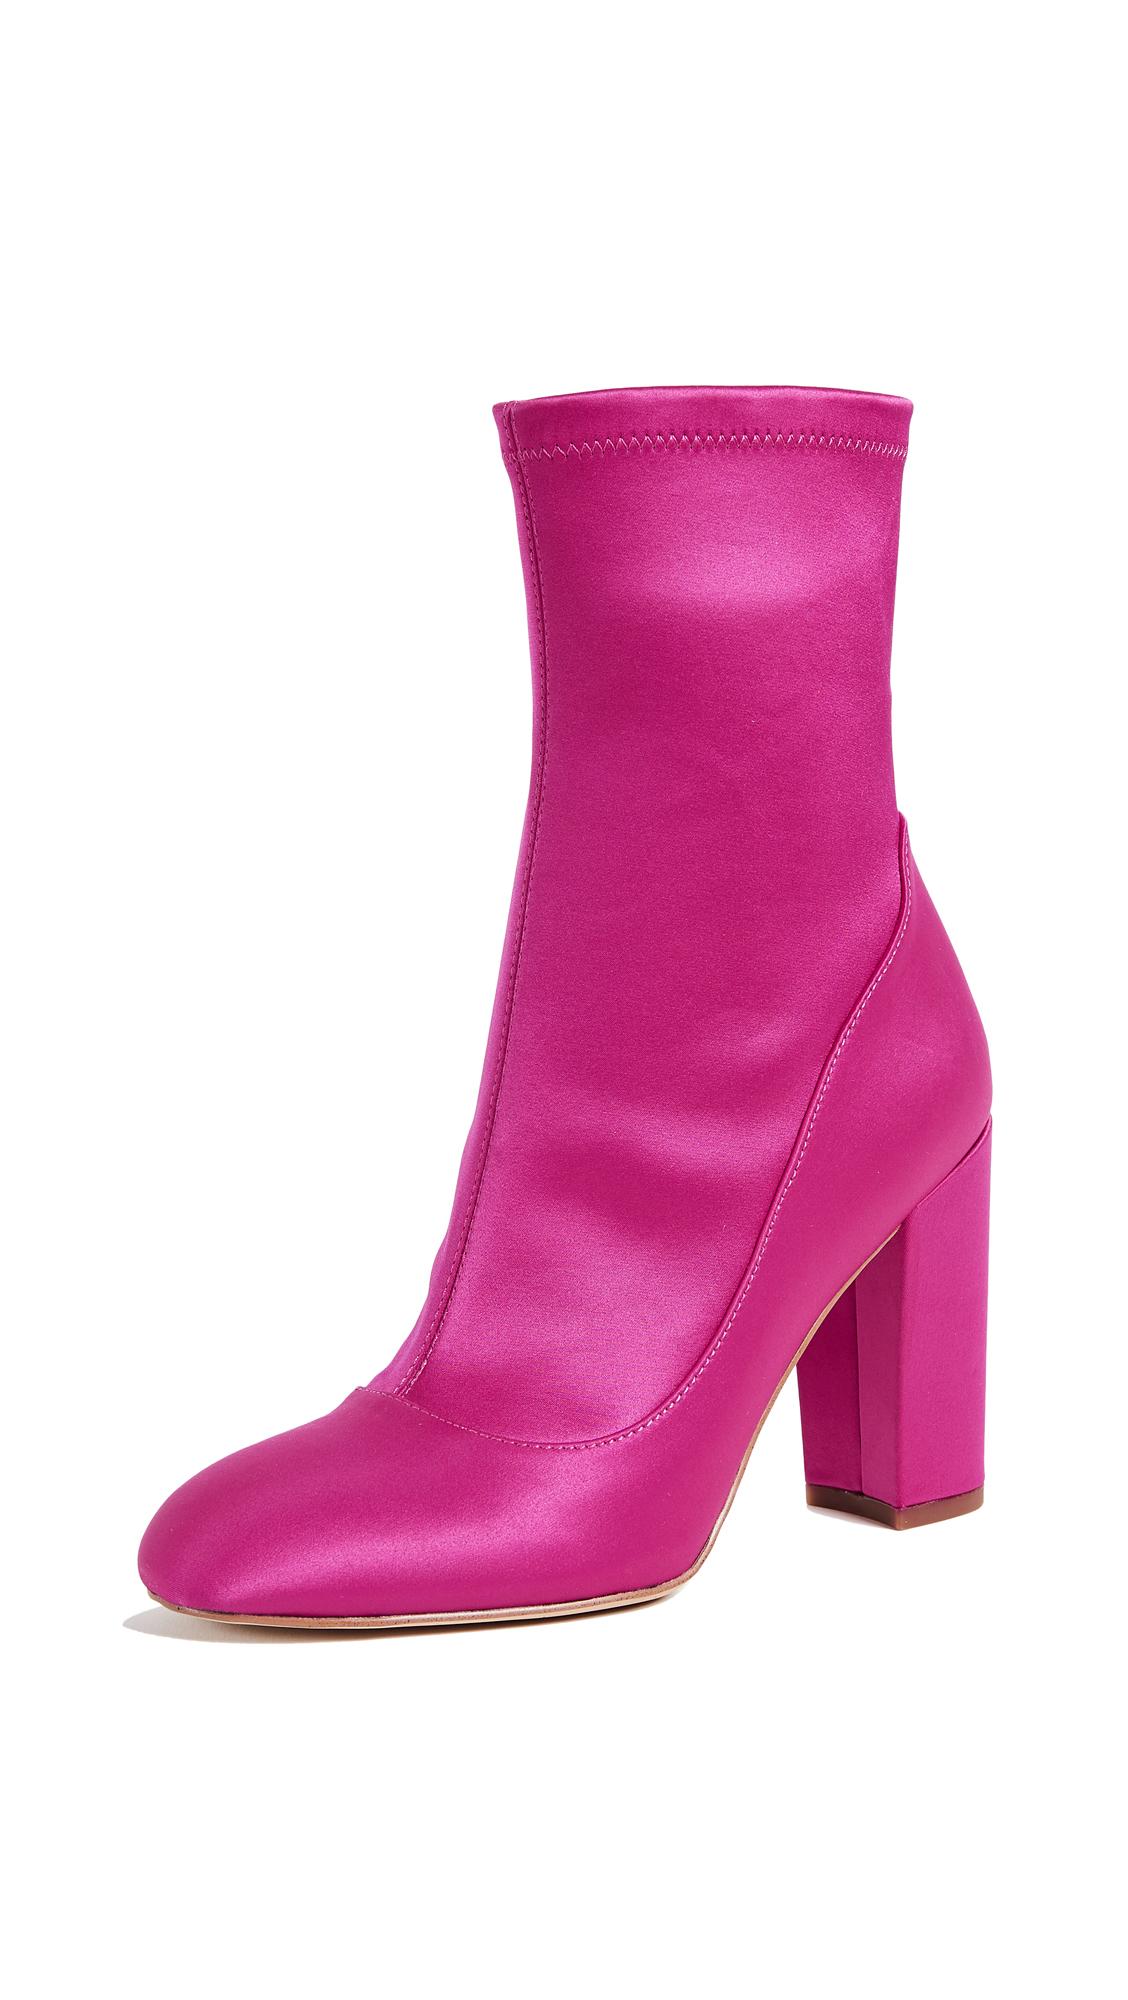 Sam Edelman Calexa Sock Booties - Berry Crush